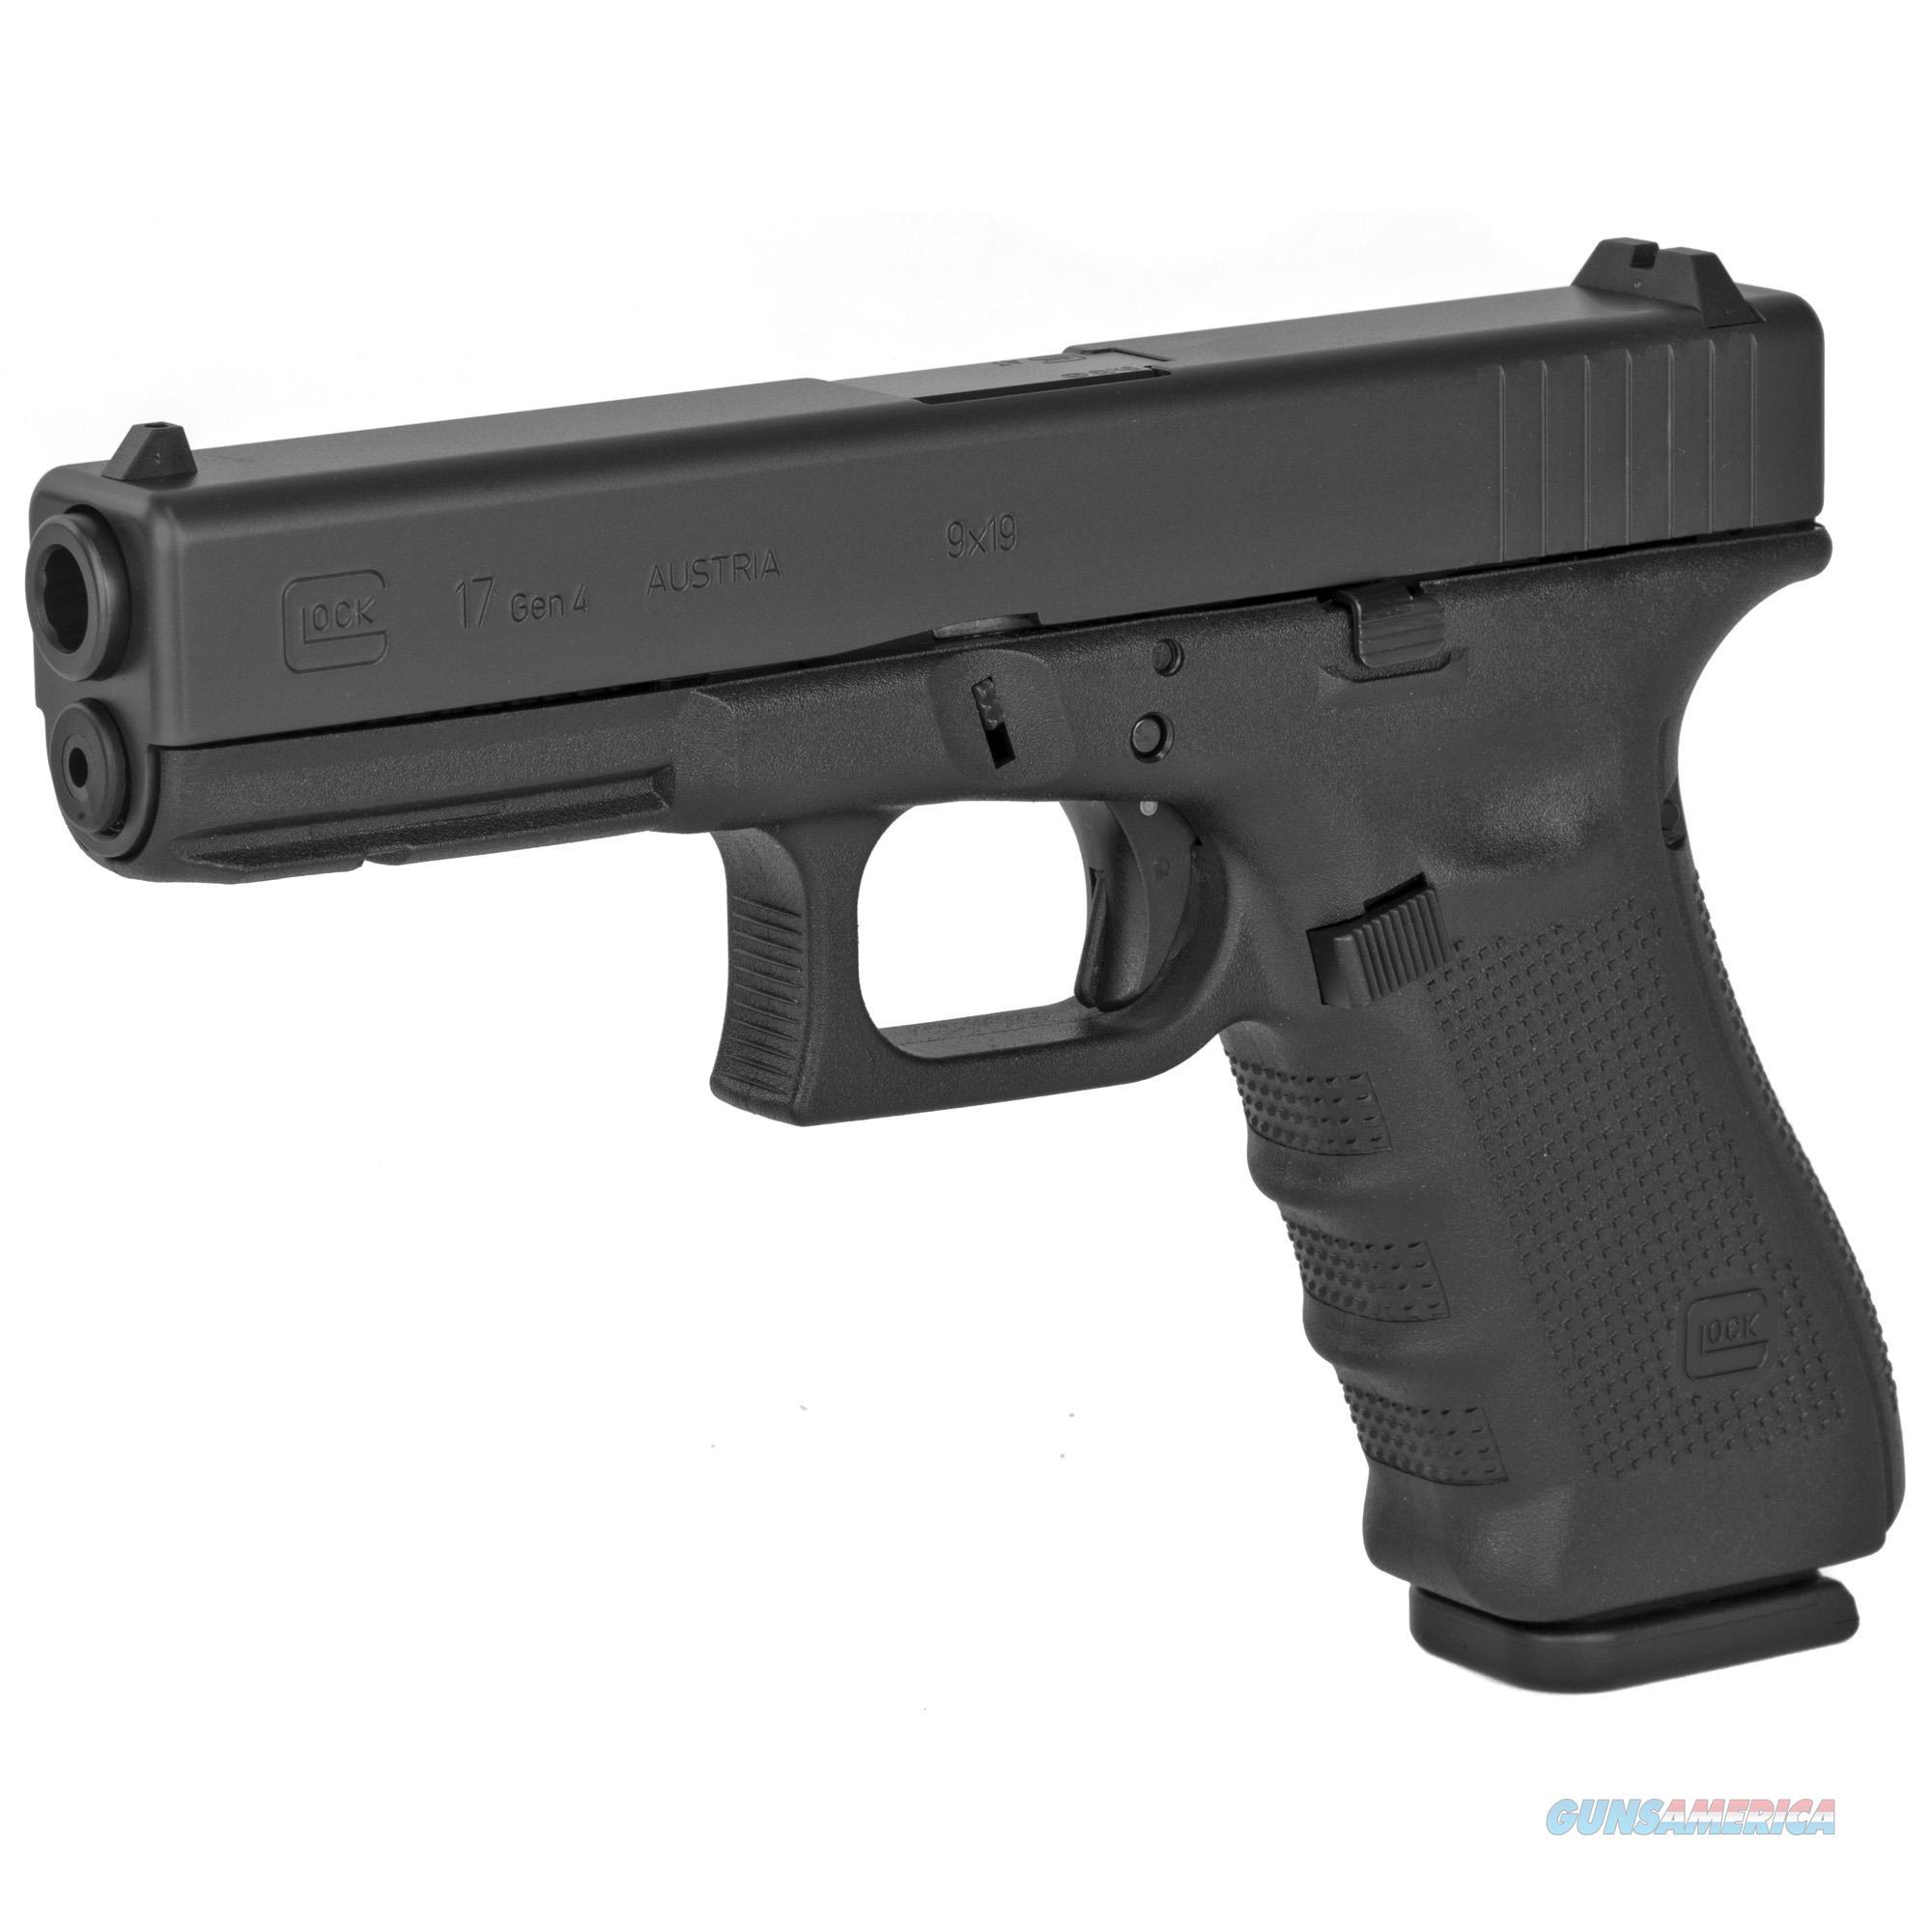 Glock 17 Gen4 9mm Pistol  - New in Box  Guns > Pistols > Glock Pistols > 17